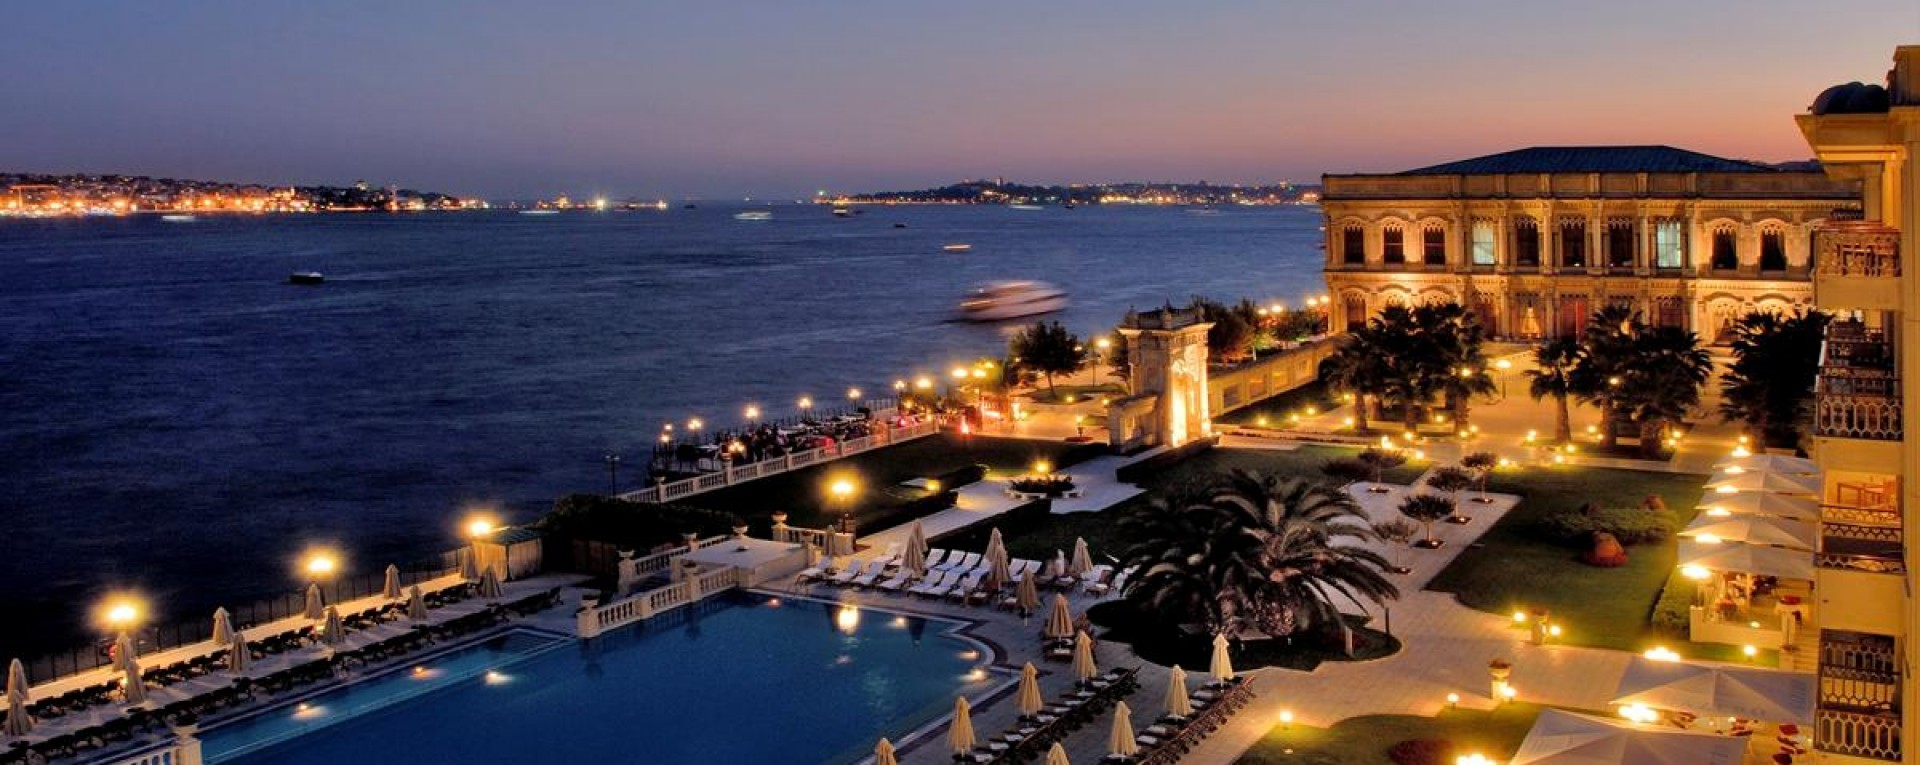 ciragan palace kempinski hotel istanbul turkey europe